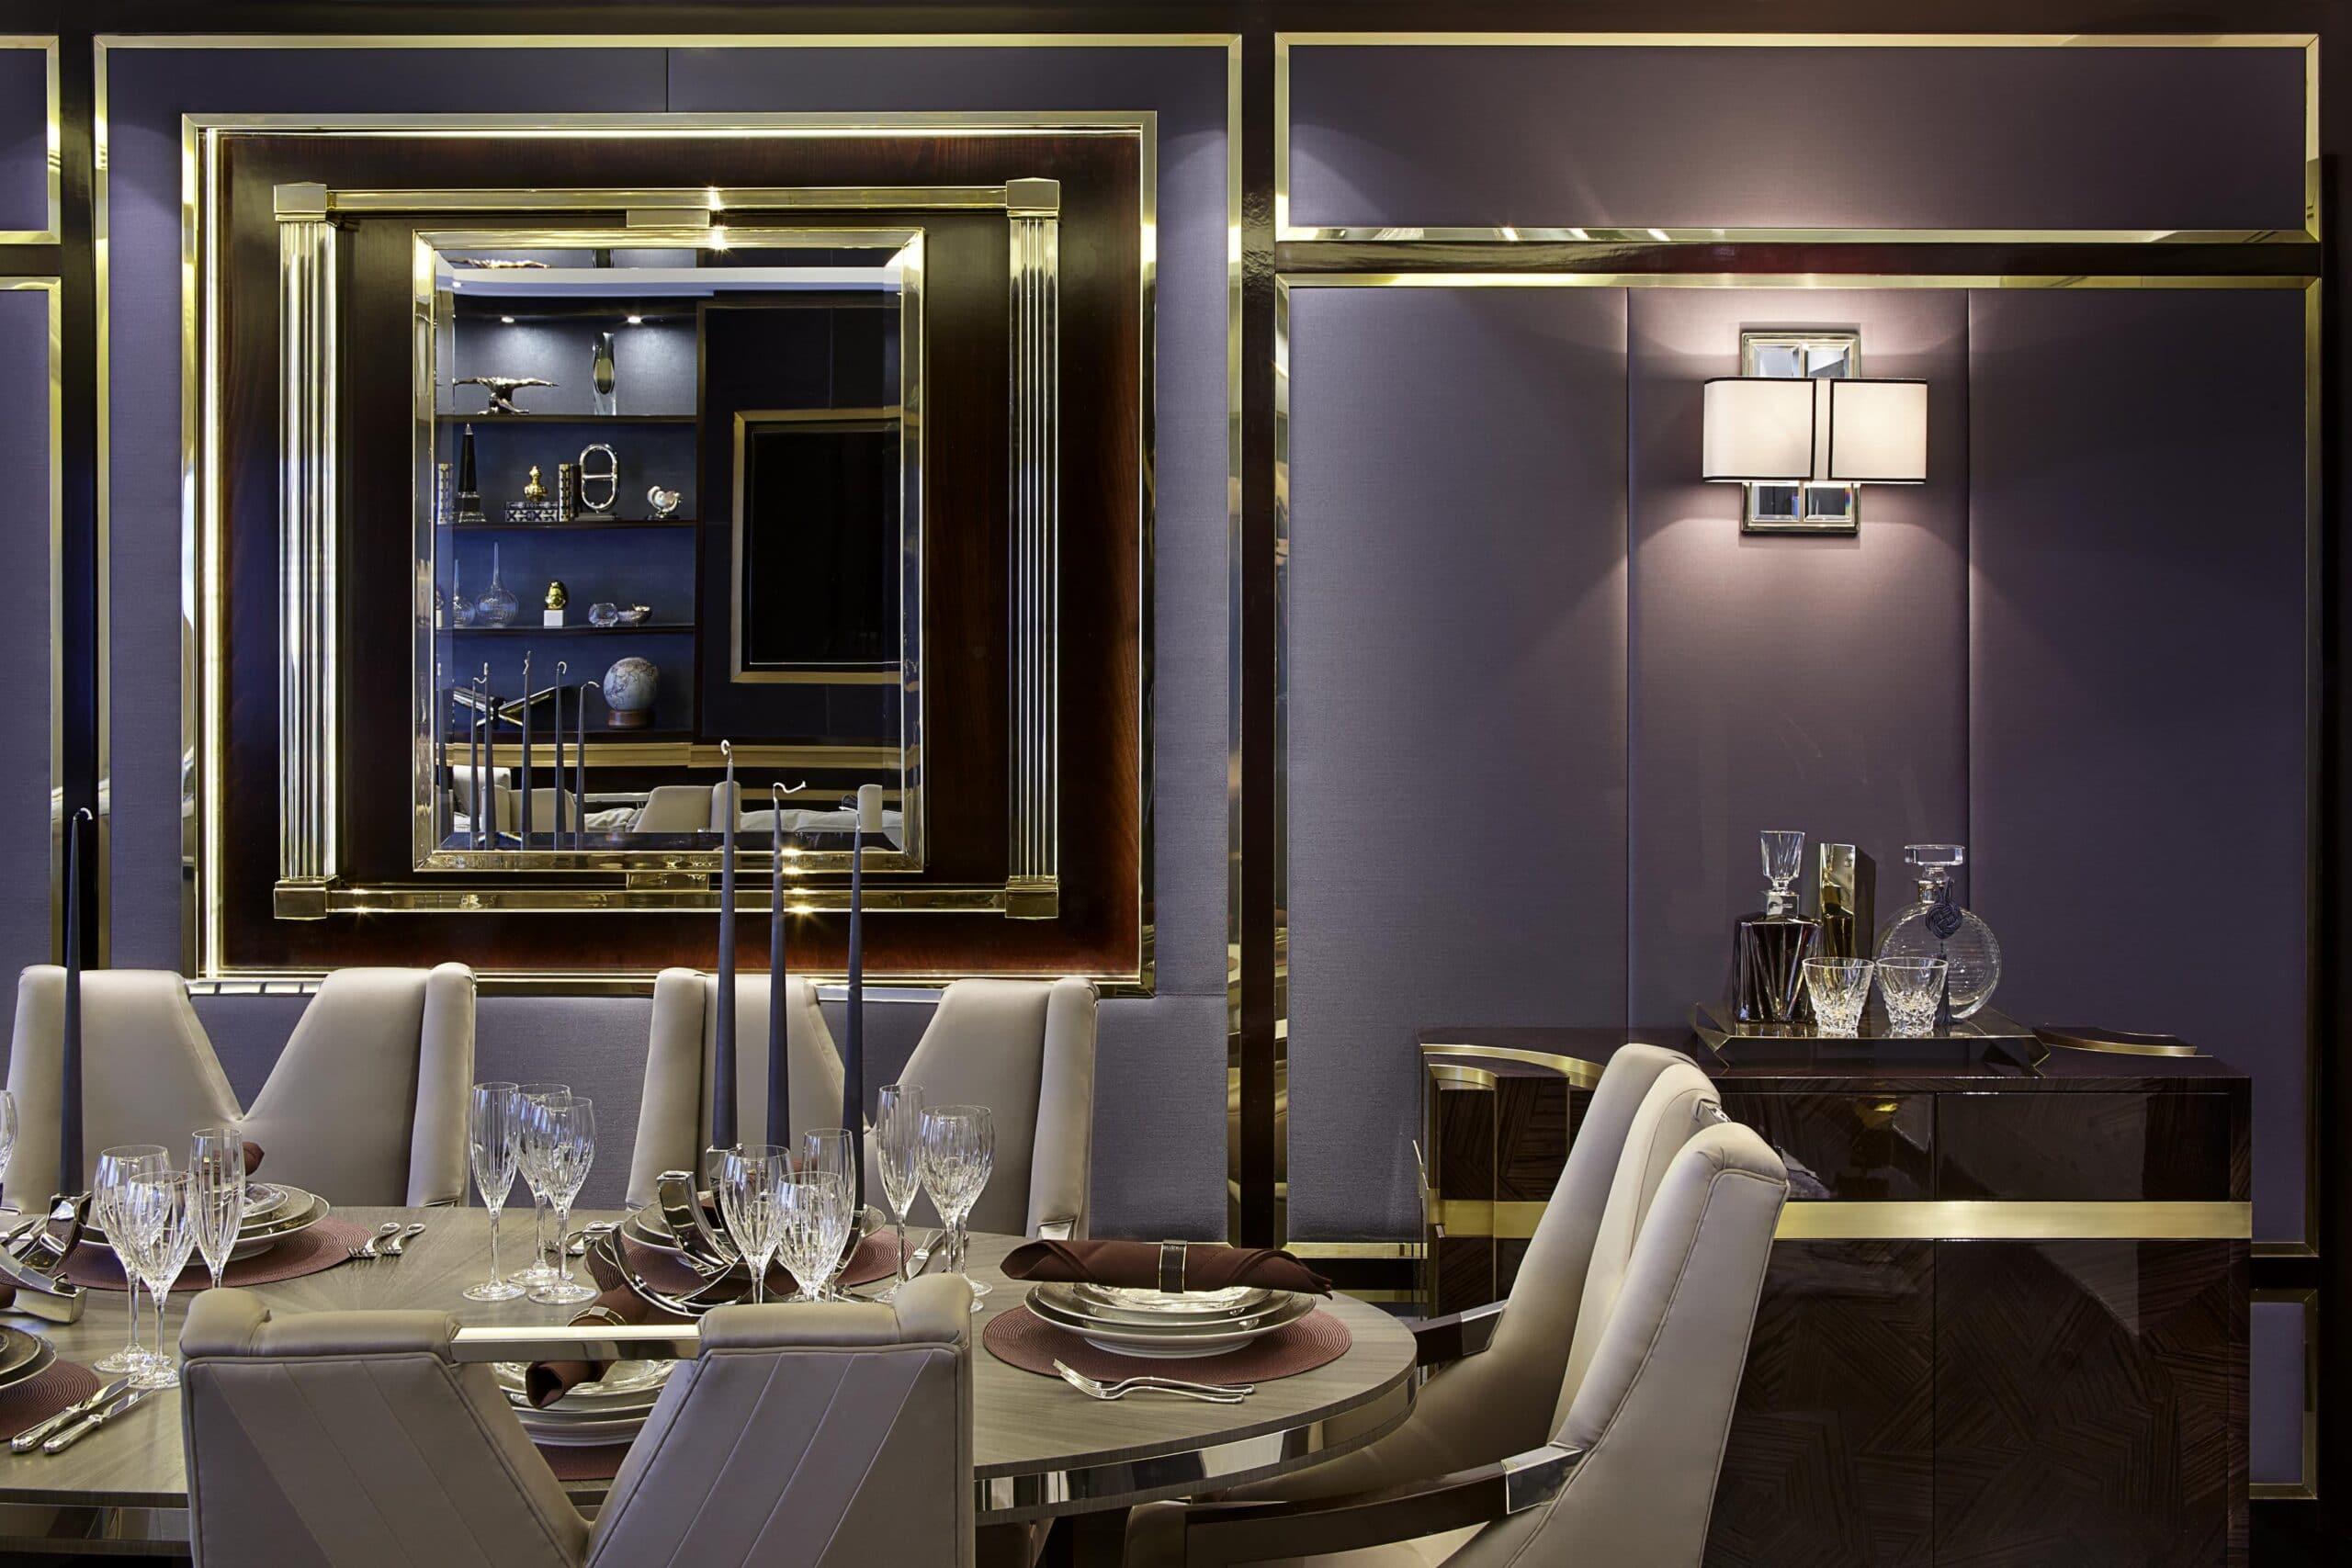 Grovesnor square interior designer London